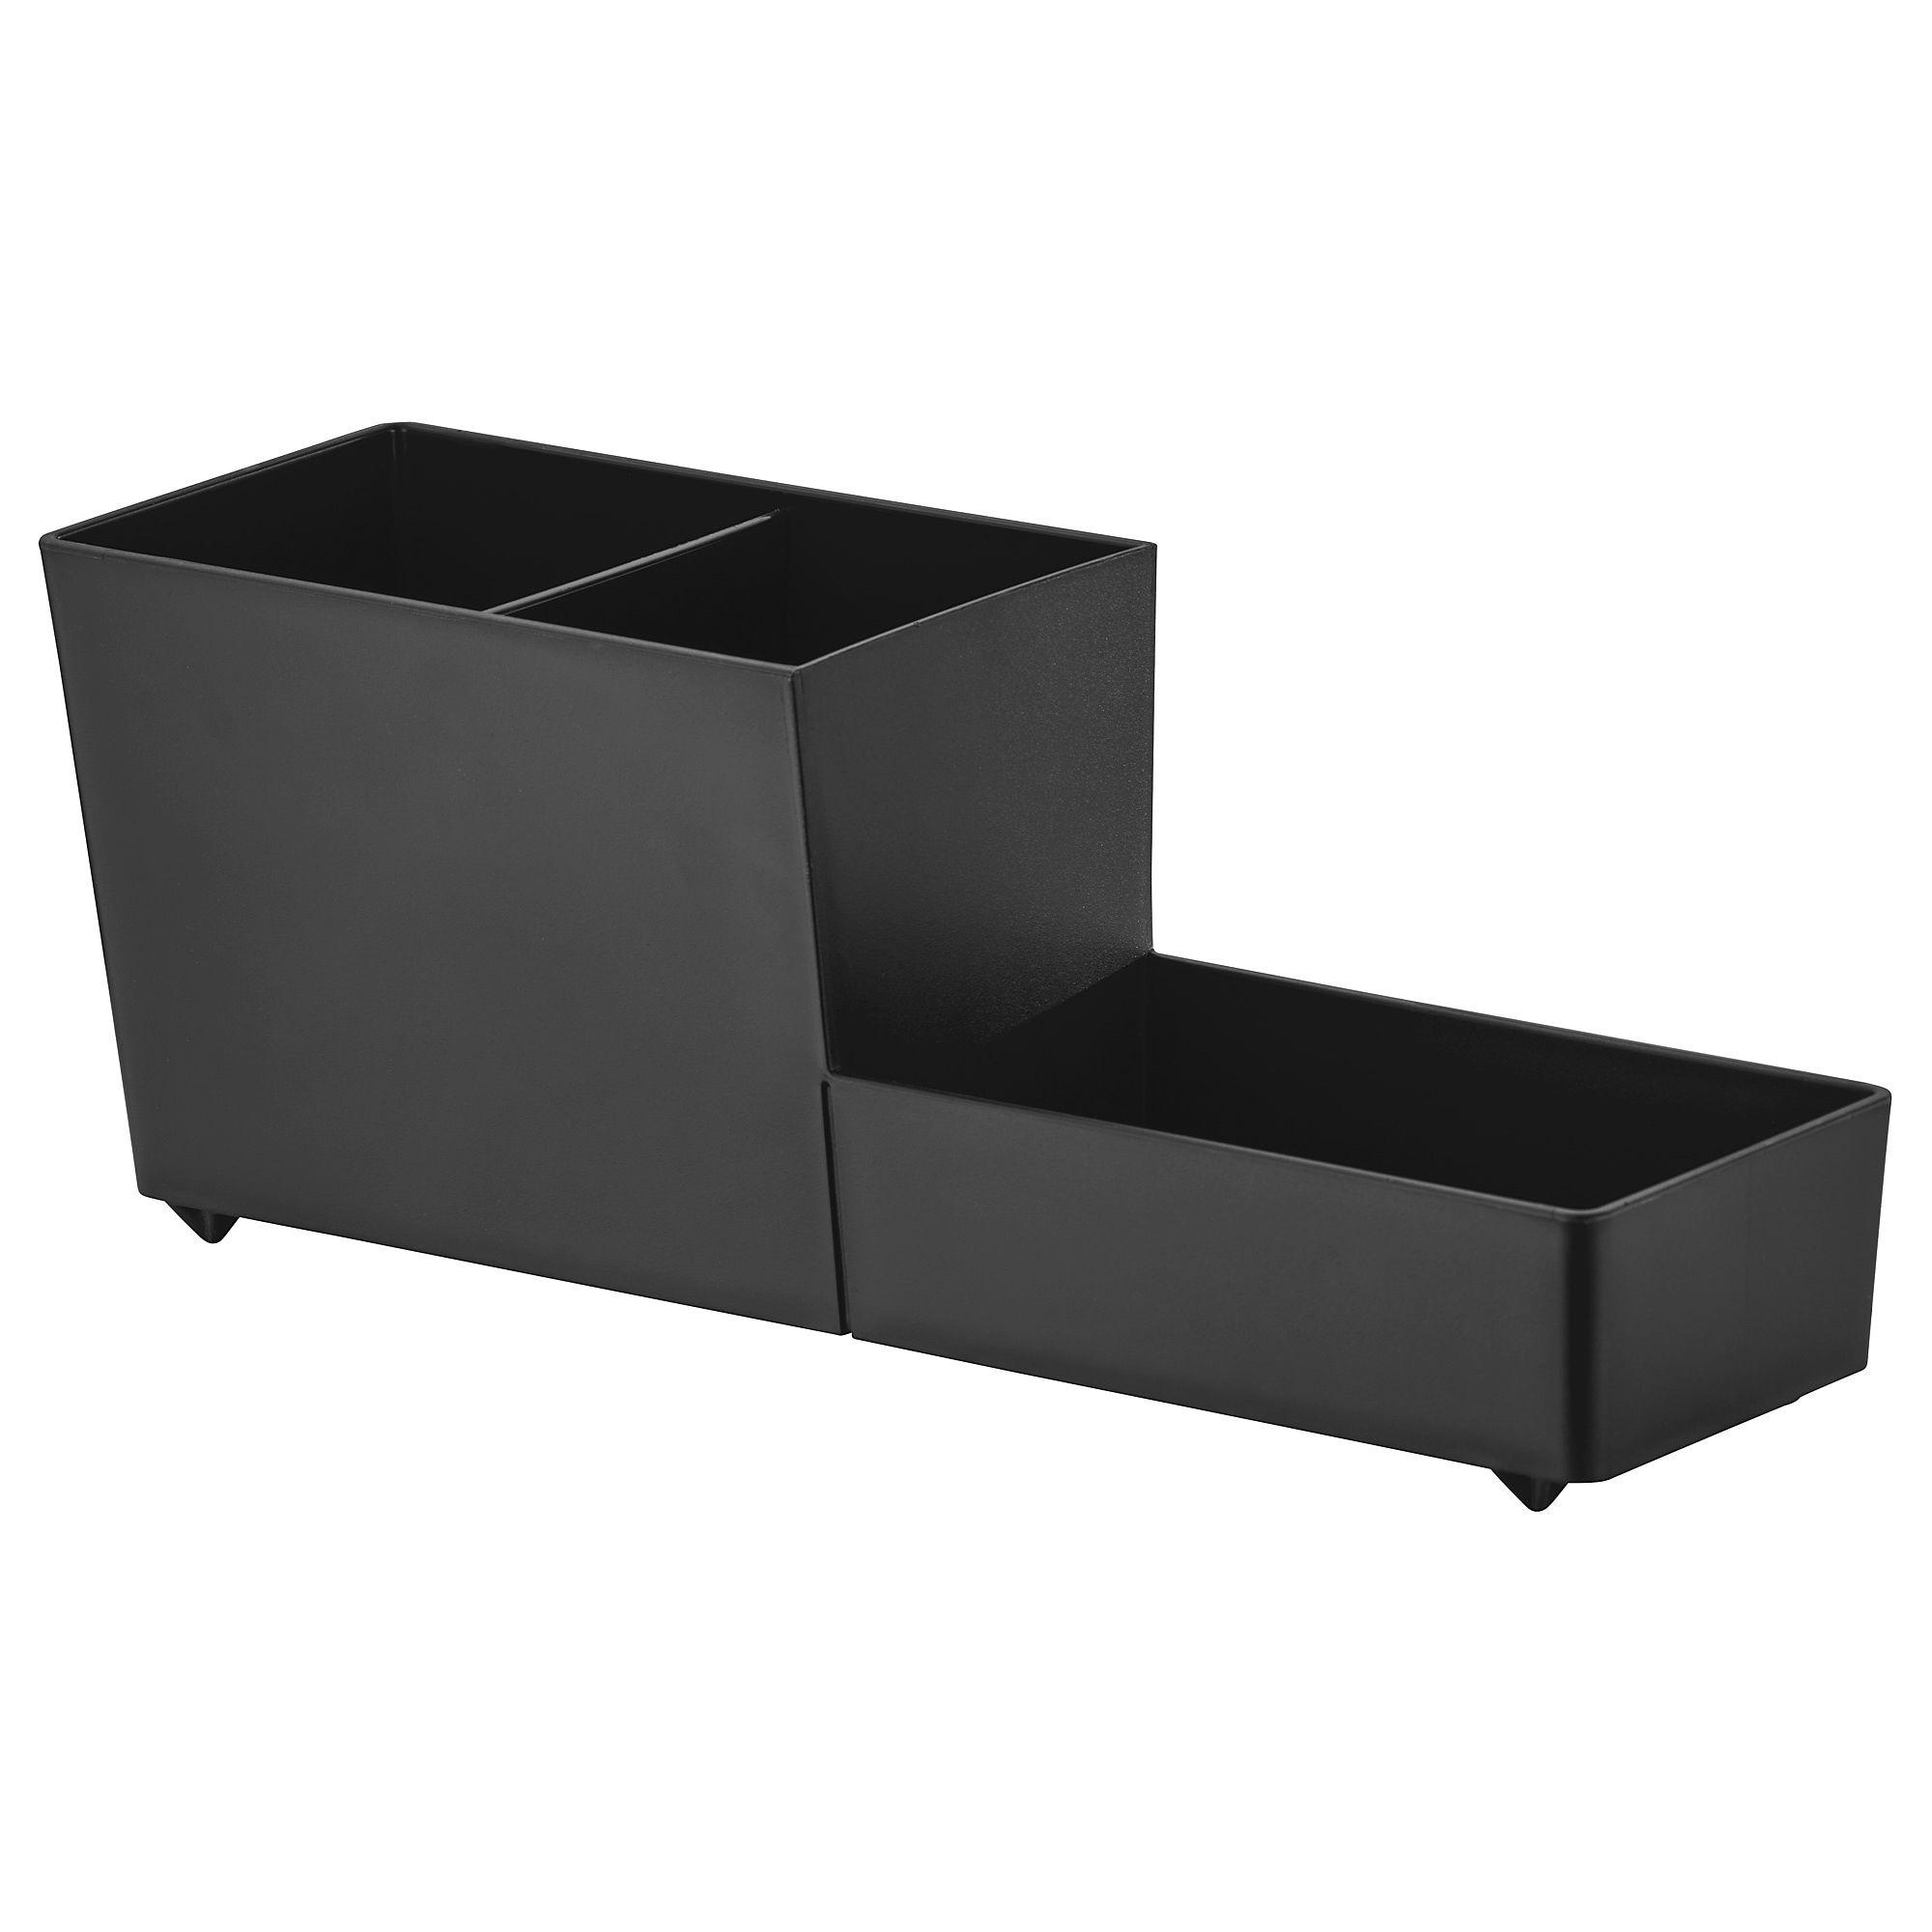 Rinnig Rek Voor Keukengerei Ikea Ikea Rekken Keukengerei